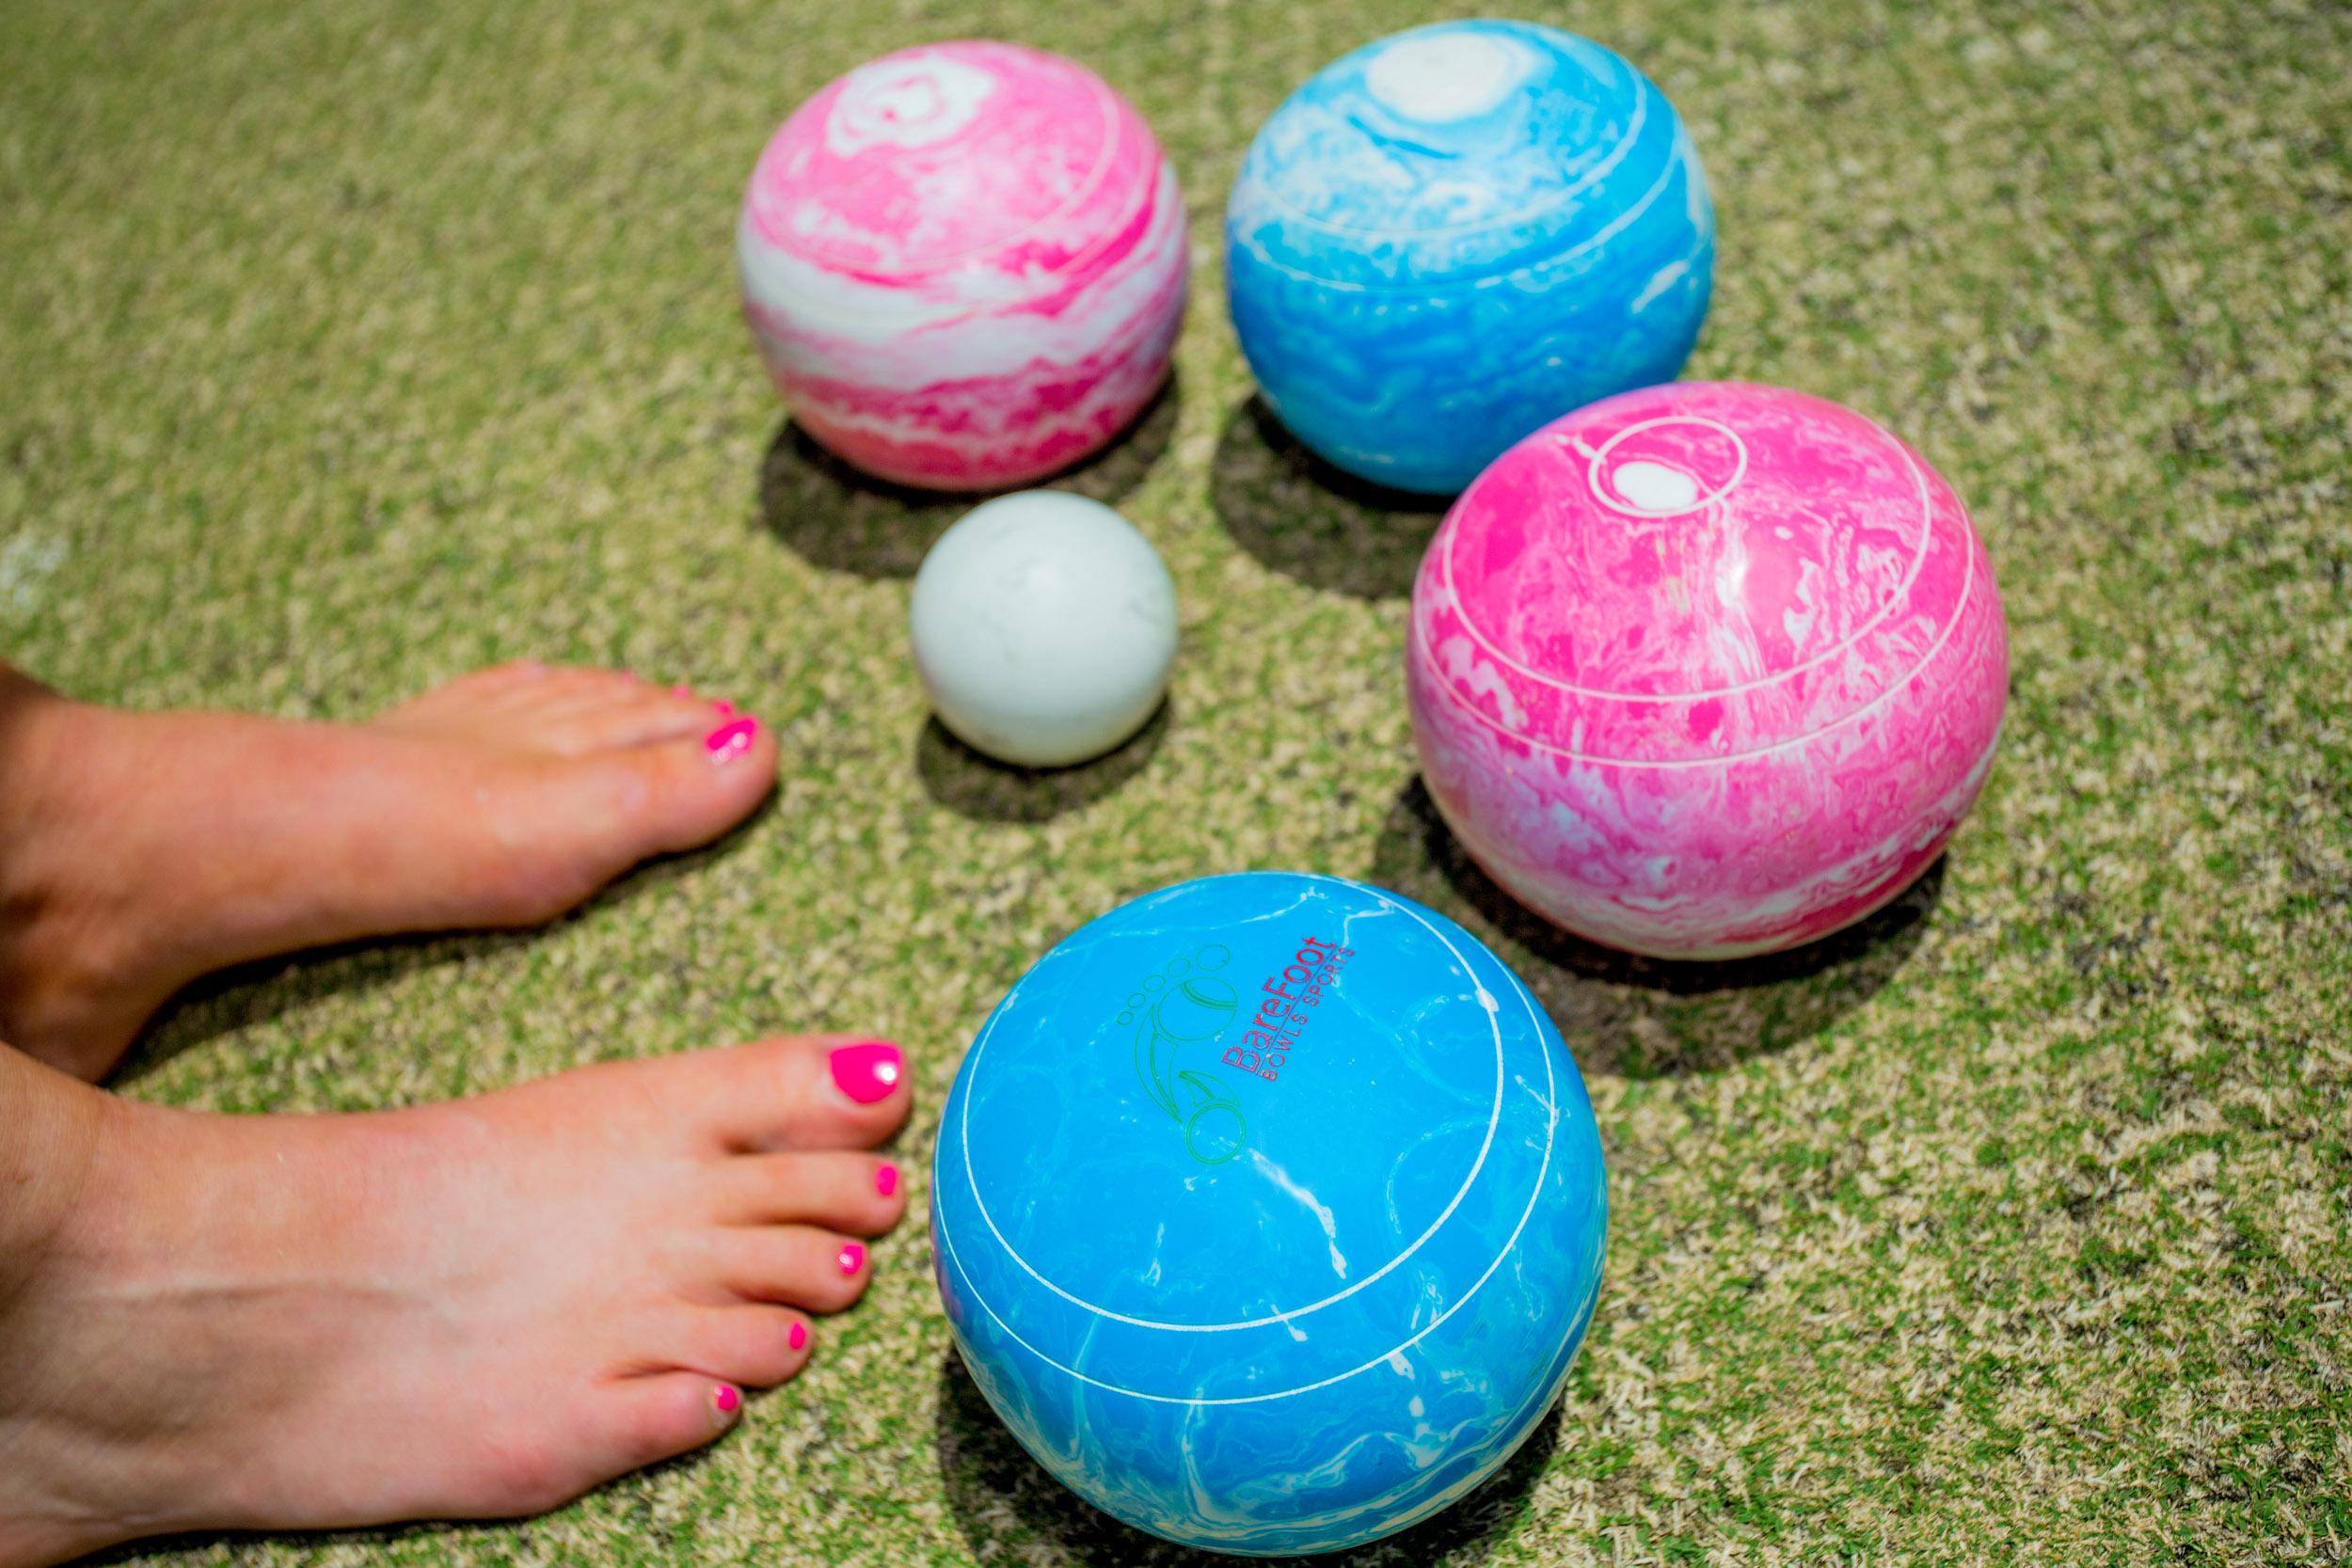 barefoot-bowls-photo.jpg